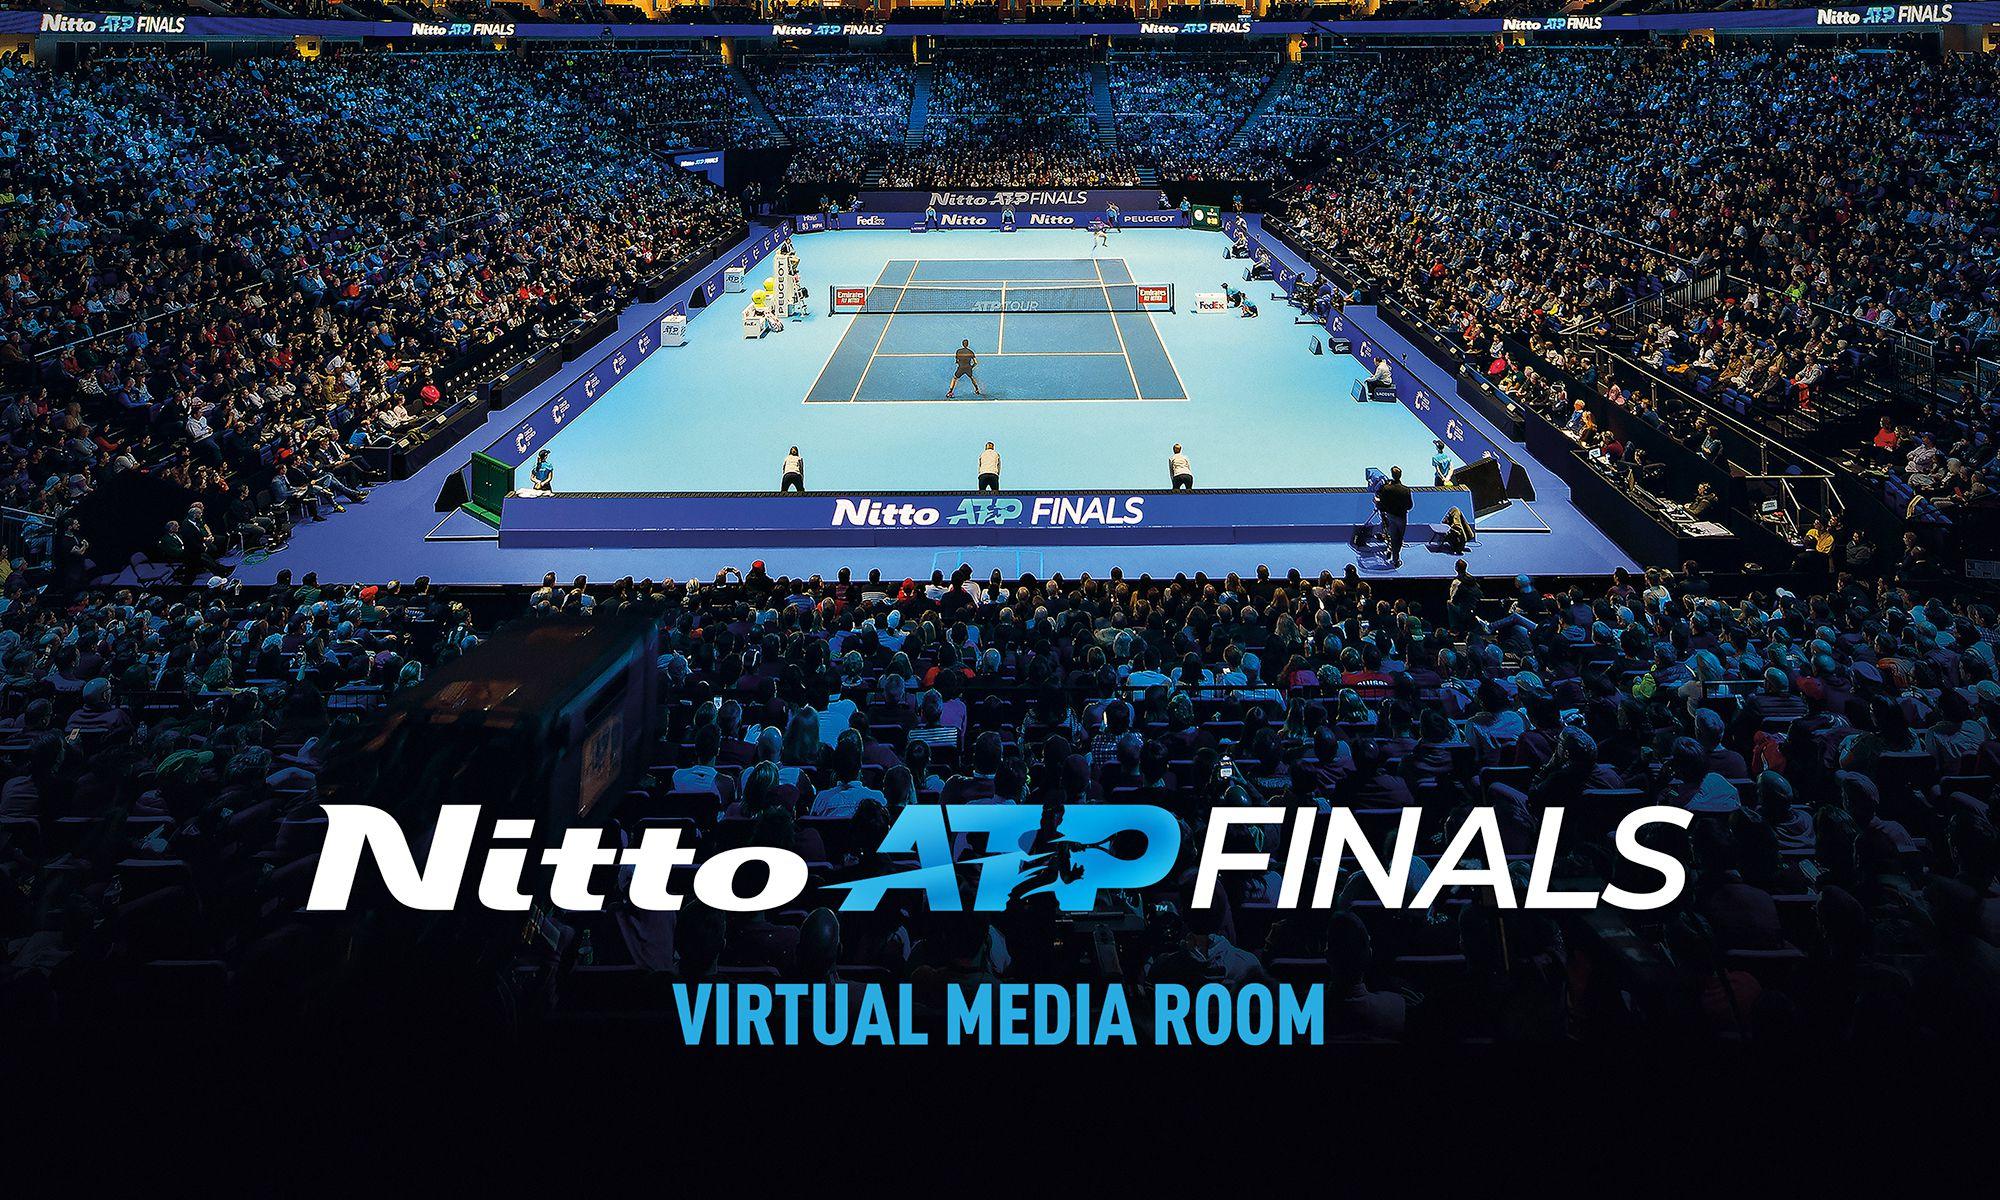 Nitto ATP Finals VMR